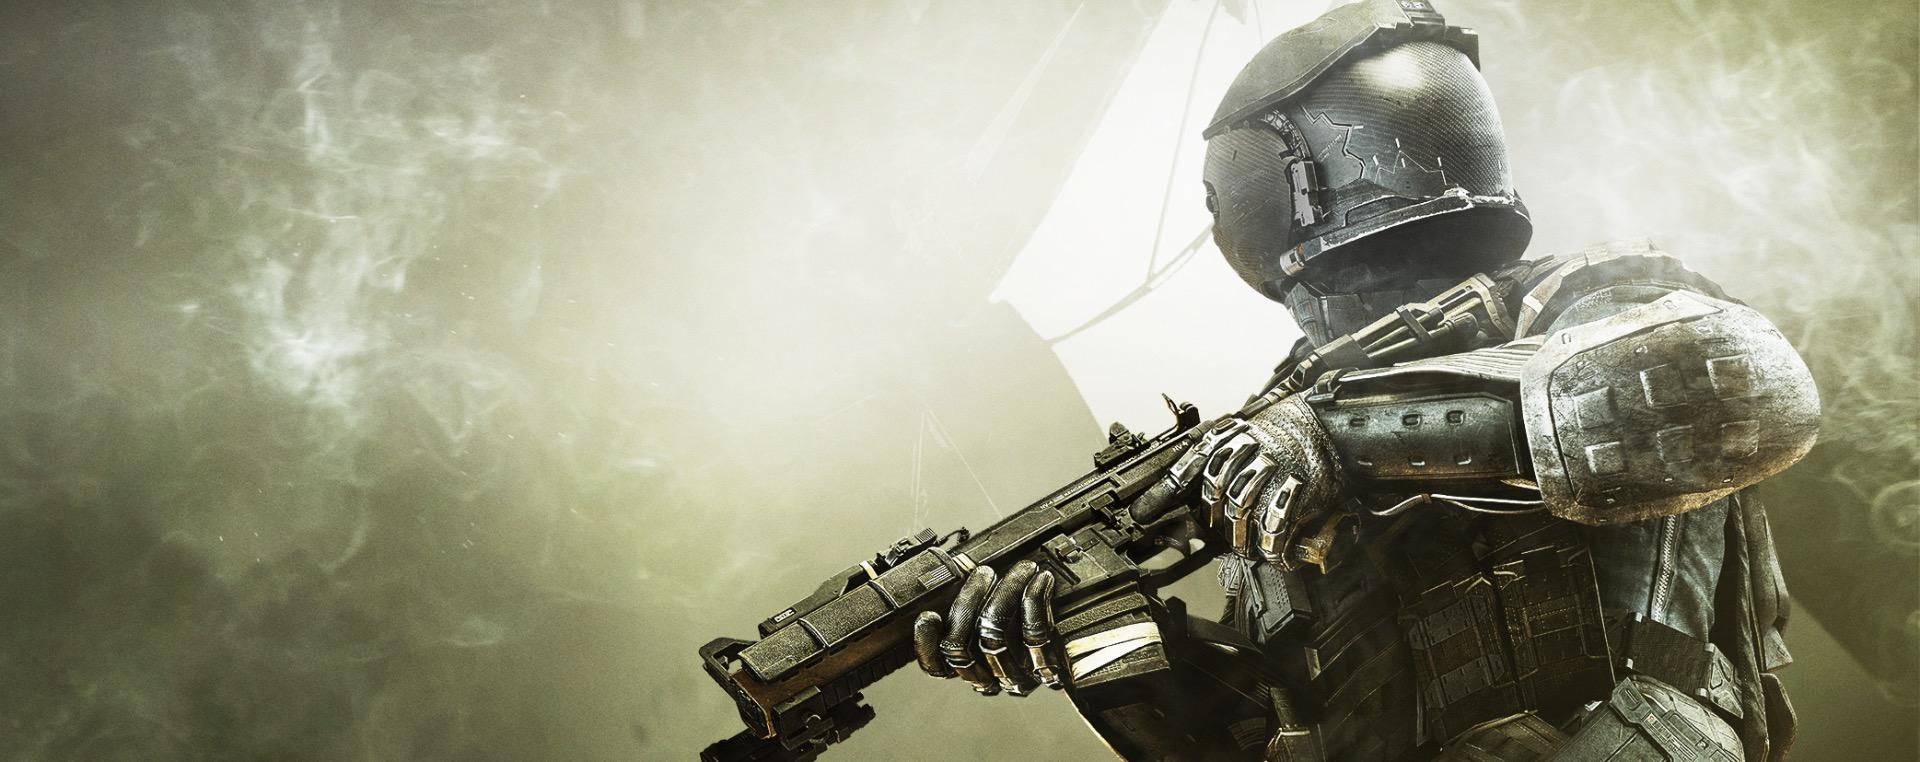 Call of Duty: Infinite Warfare's Sabotage DLC Multiplayer ...